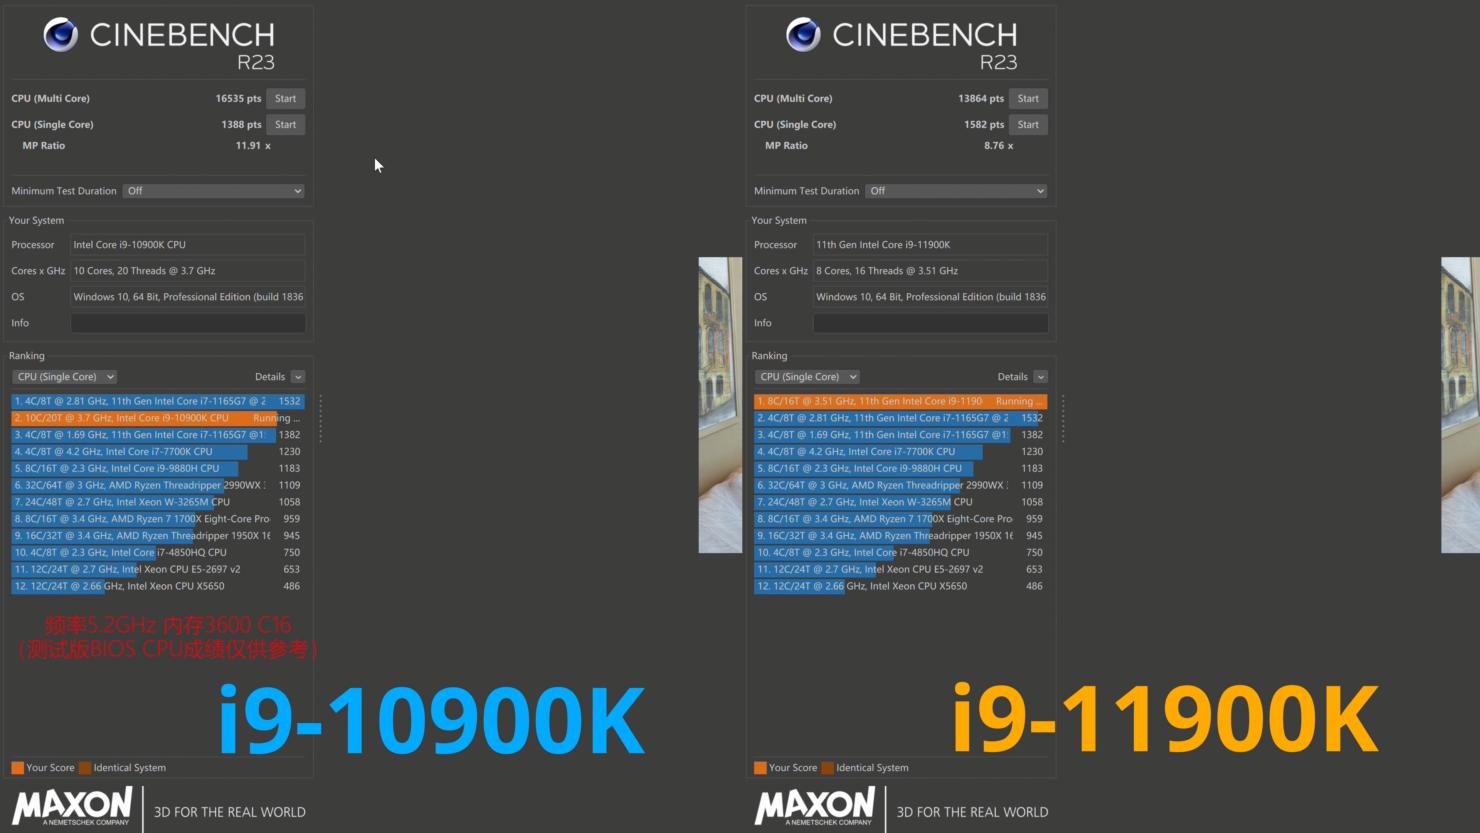 intel-core-i9-11900k-8-core-rocket-lake-vs-core-i9-10900k-10-core-comet-lake-cpu-_-5-2-ghz-overclock-_-cinebench-r23